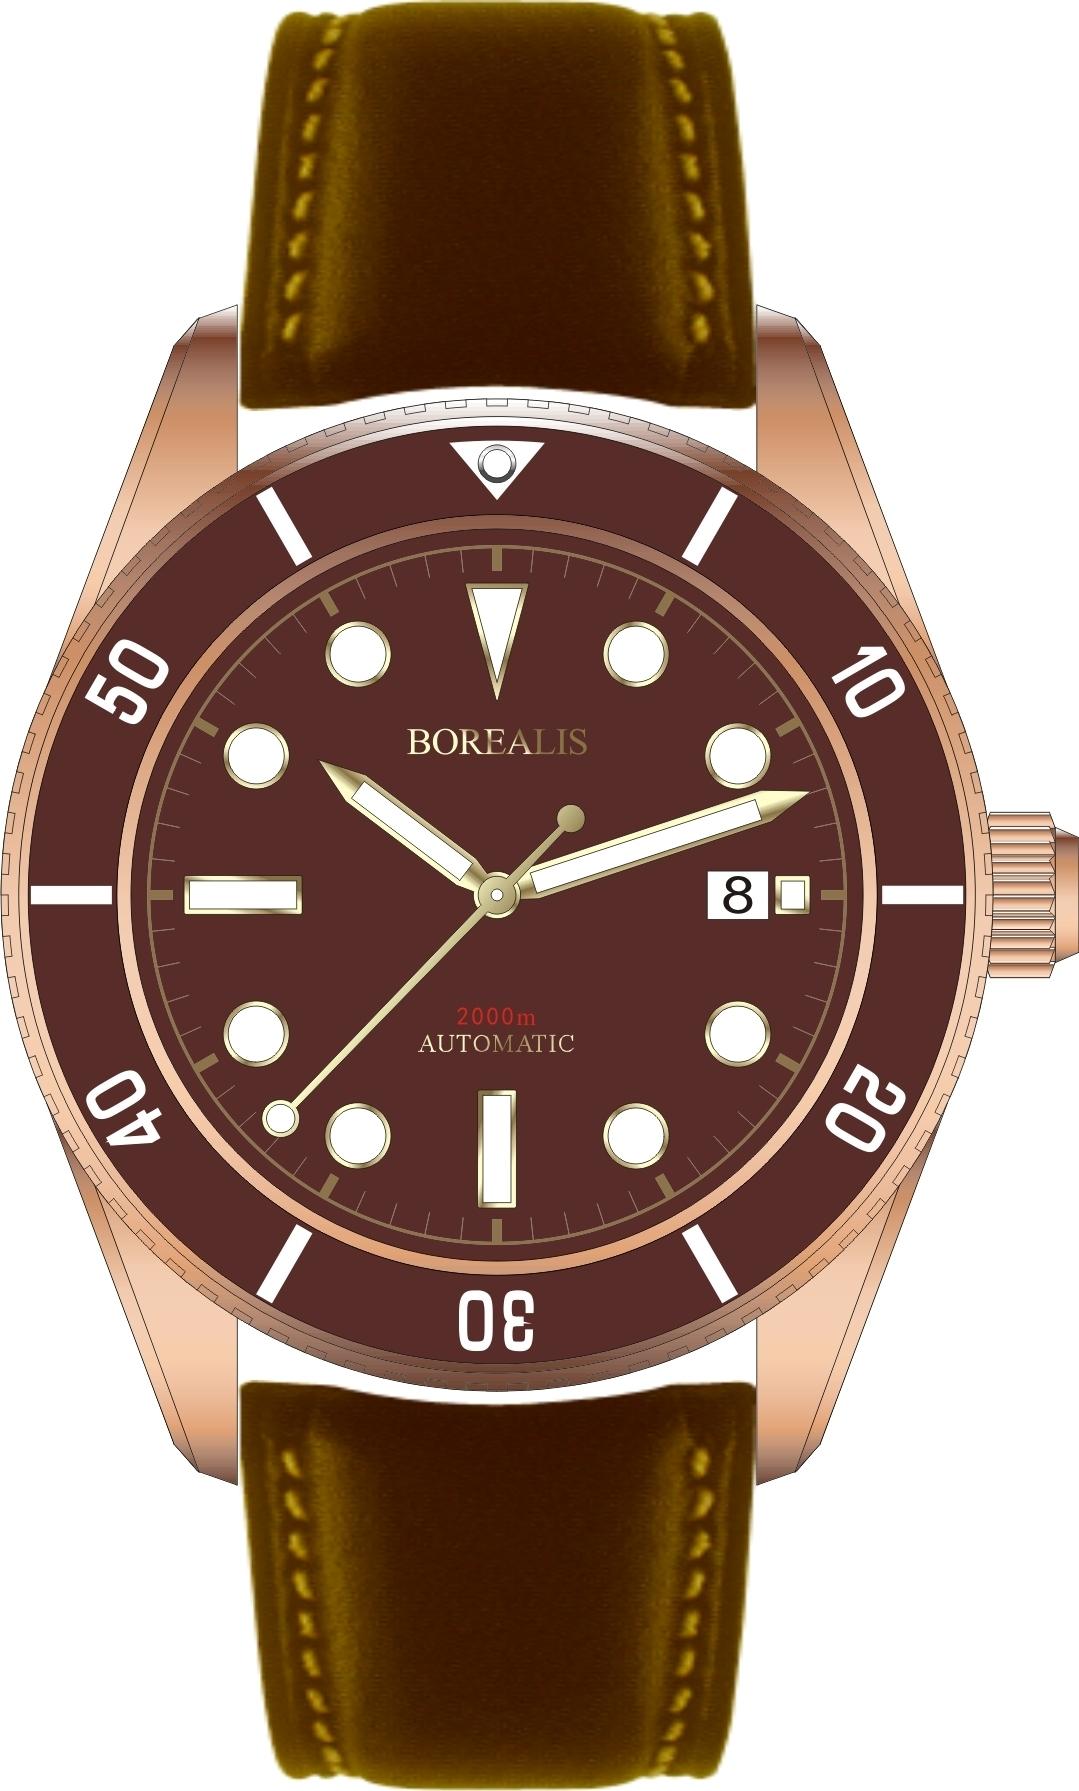 Pre-Order Borealis Bull Shark Bronze CuSn8 Automatic Diver Watch Date Miyota 9015 Ceramic Brown Bezel Bezel Brown Dial